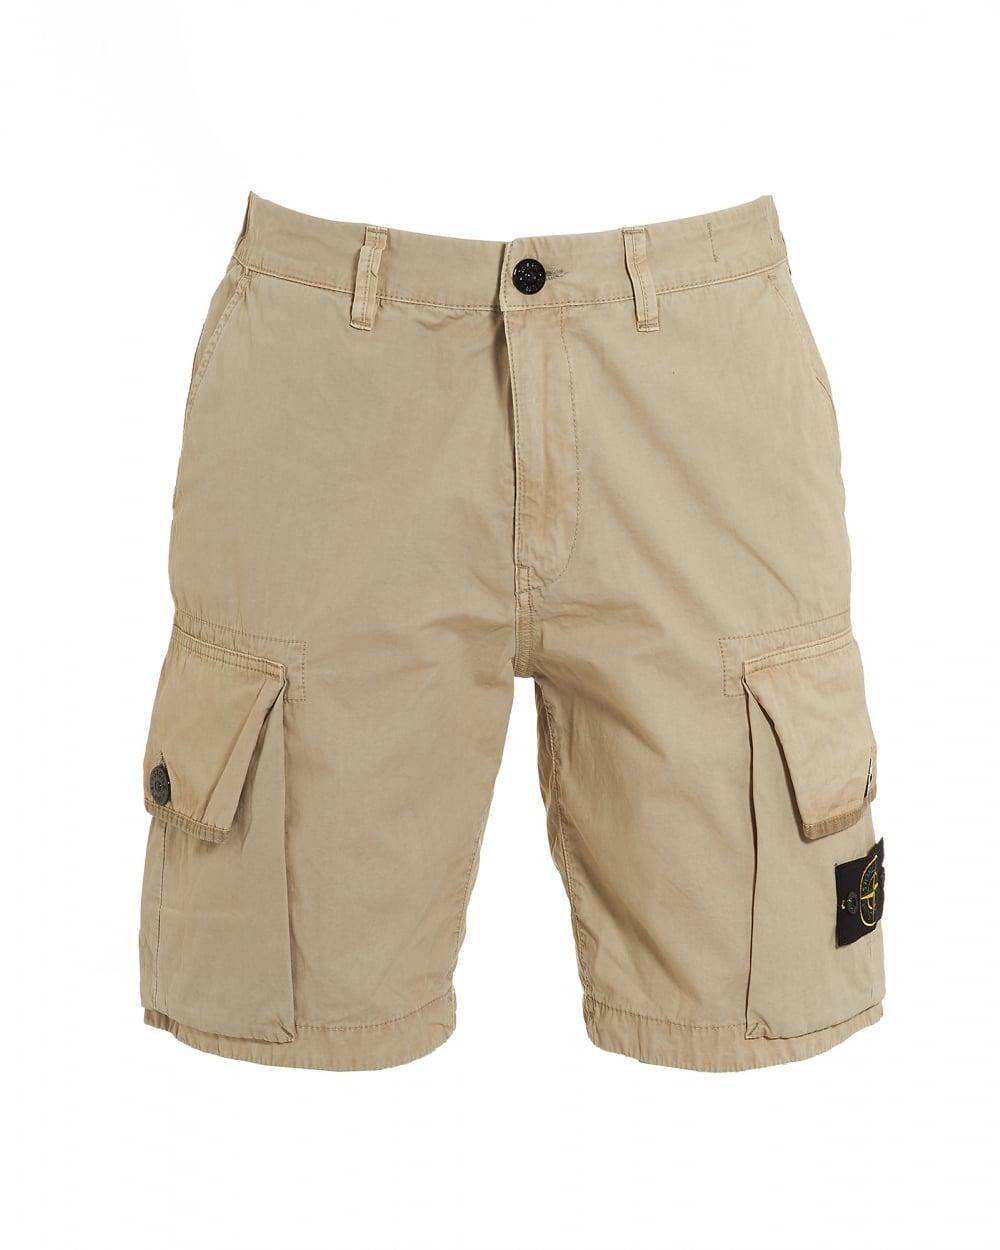 Stone Island Mens T.CO OLD Beige Cargo Pocket Shorts